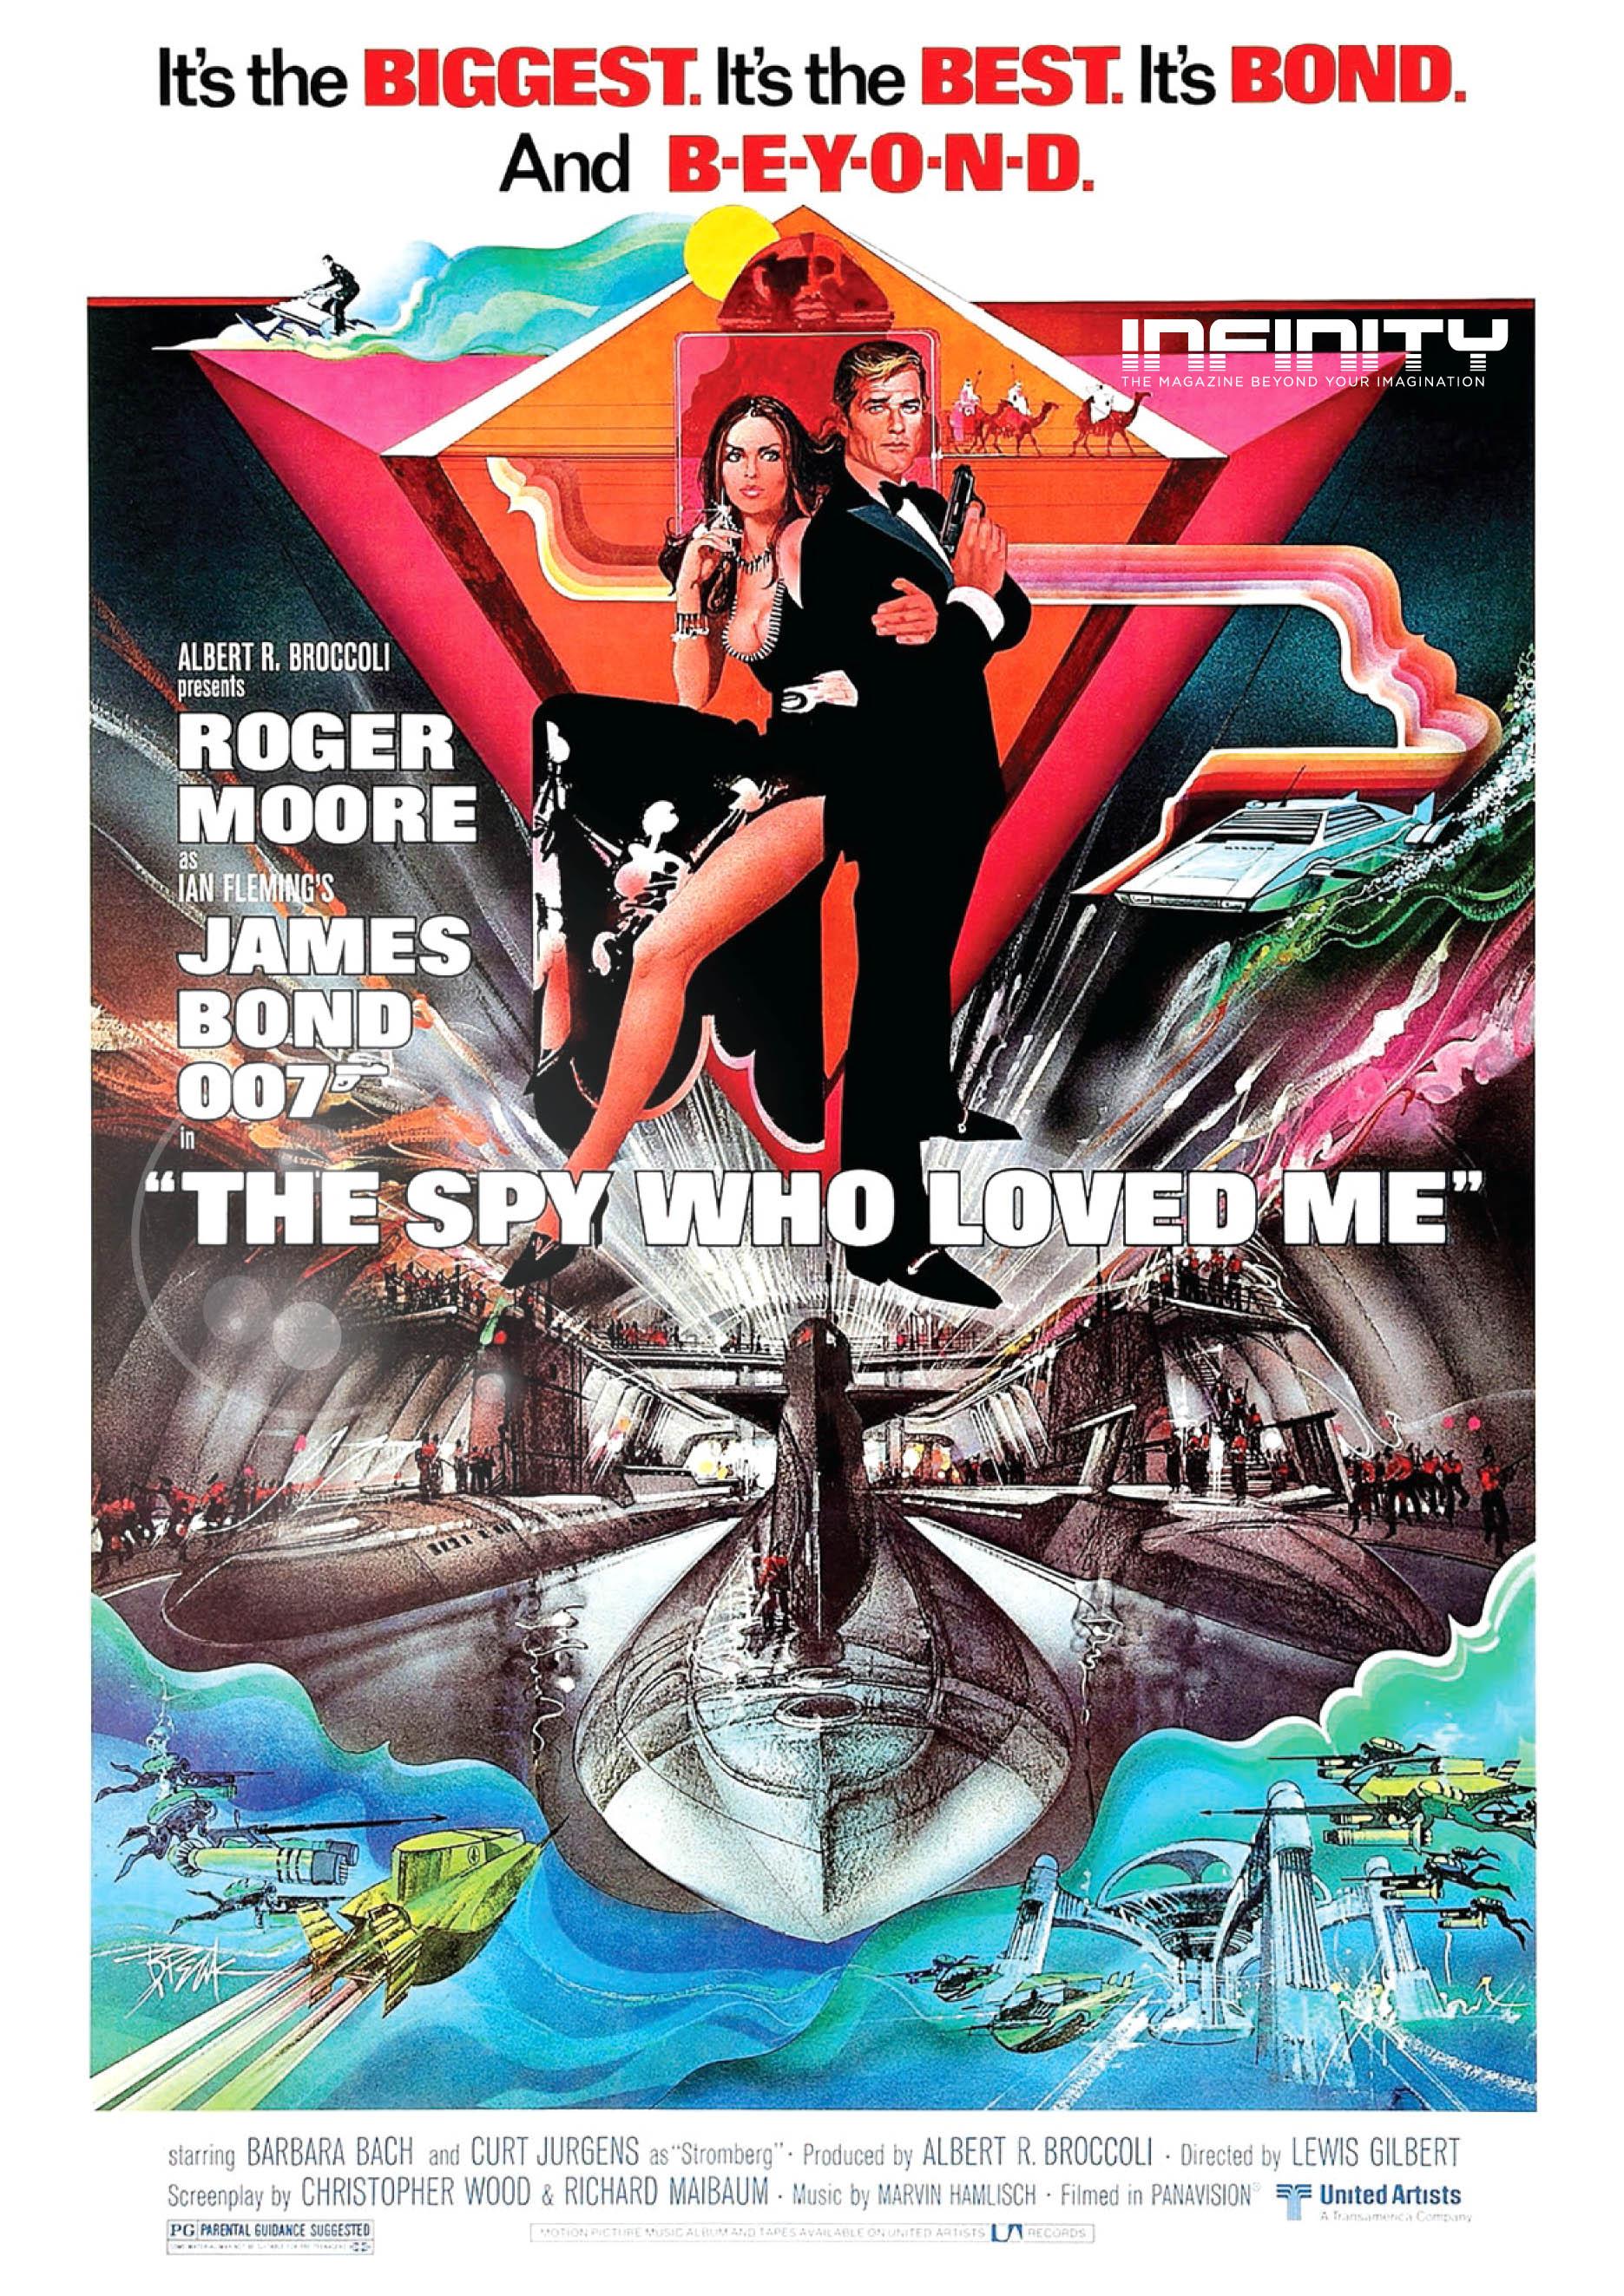 Infinity 25 2020-02 Bond.jpg